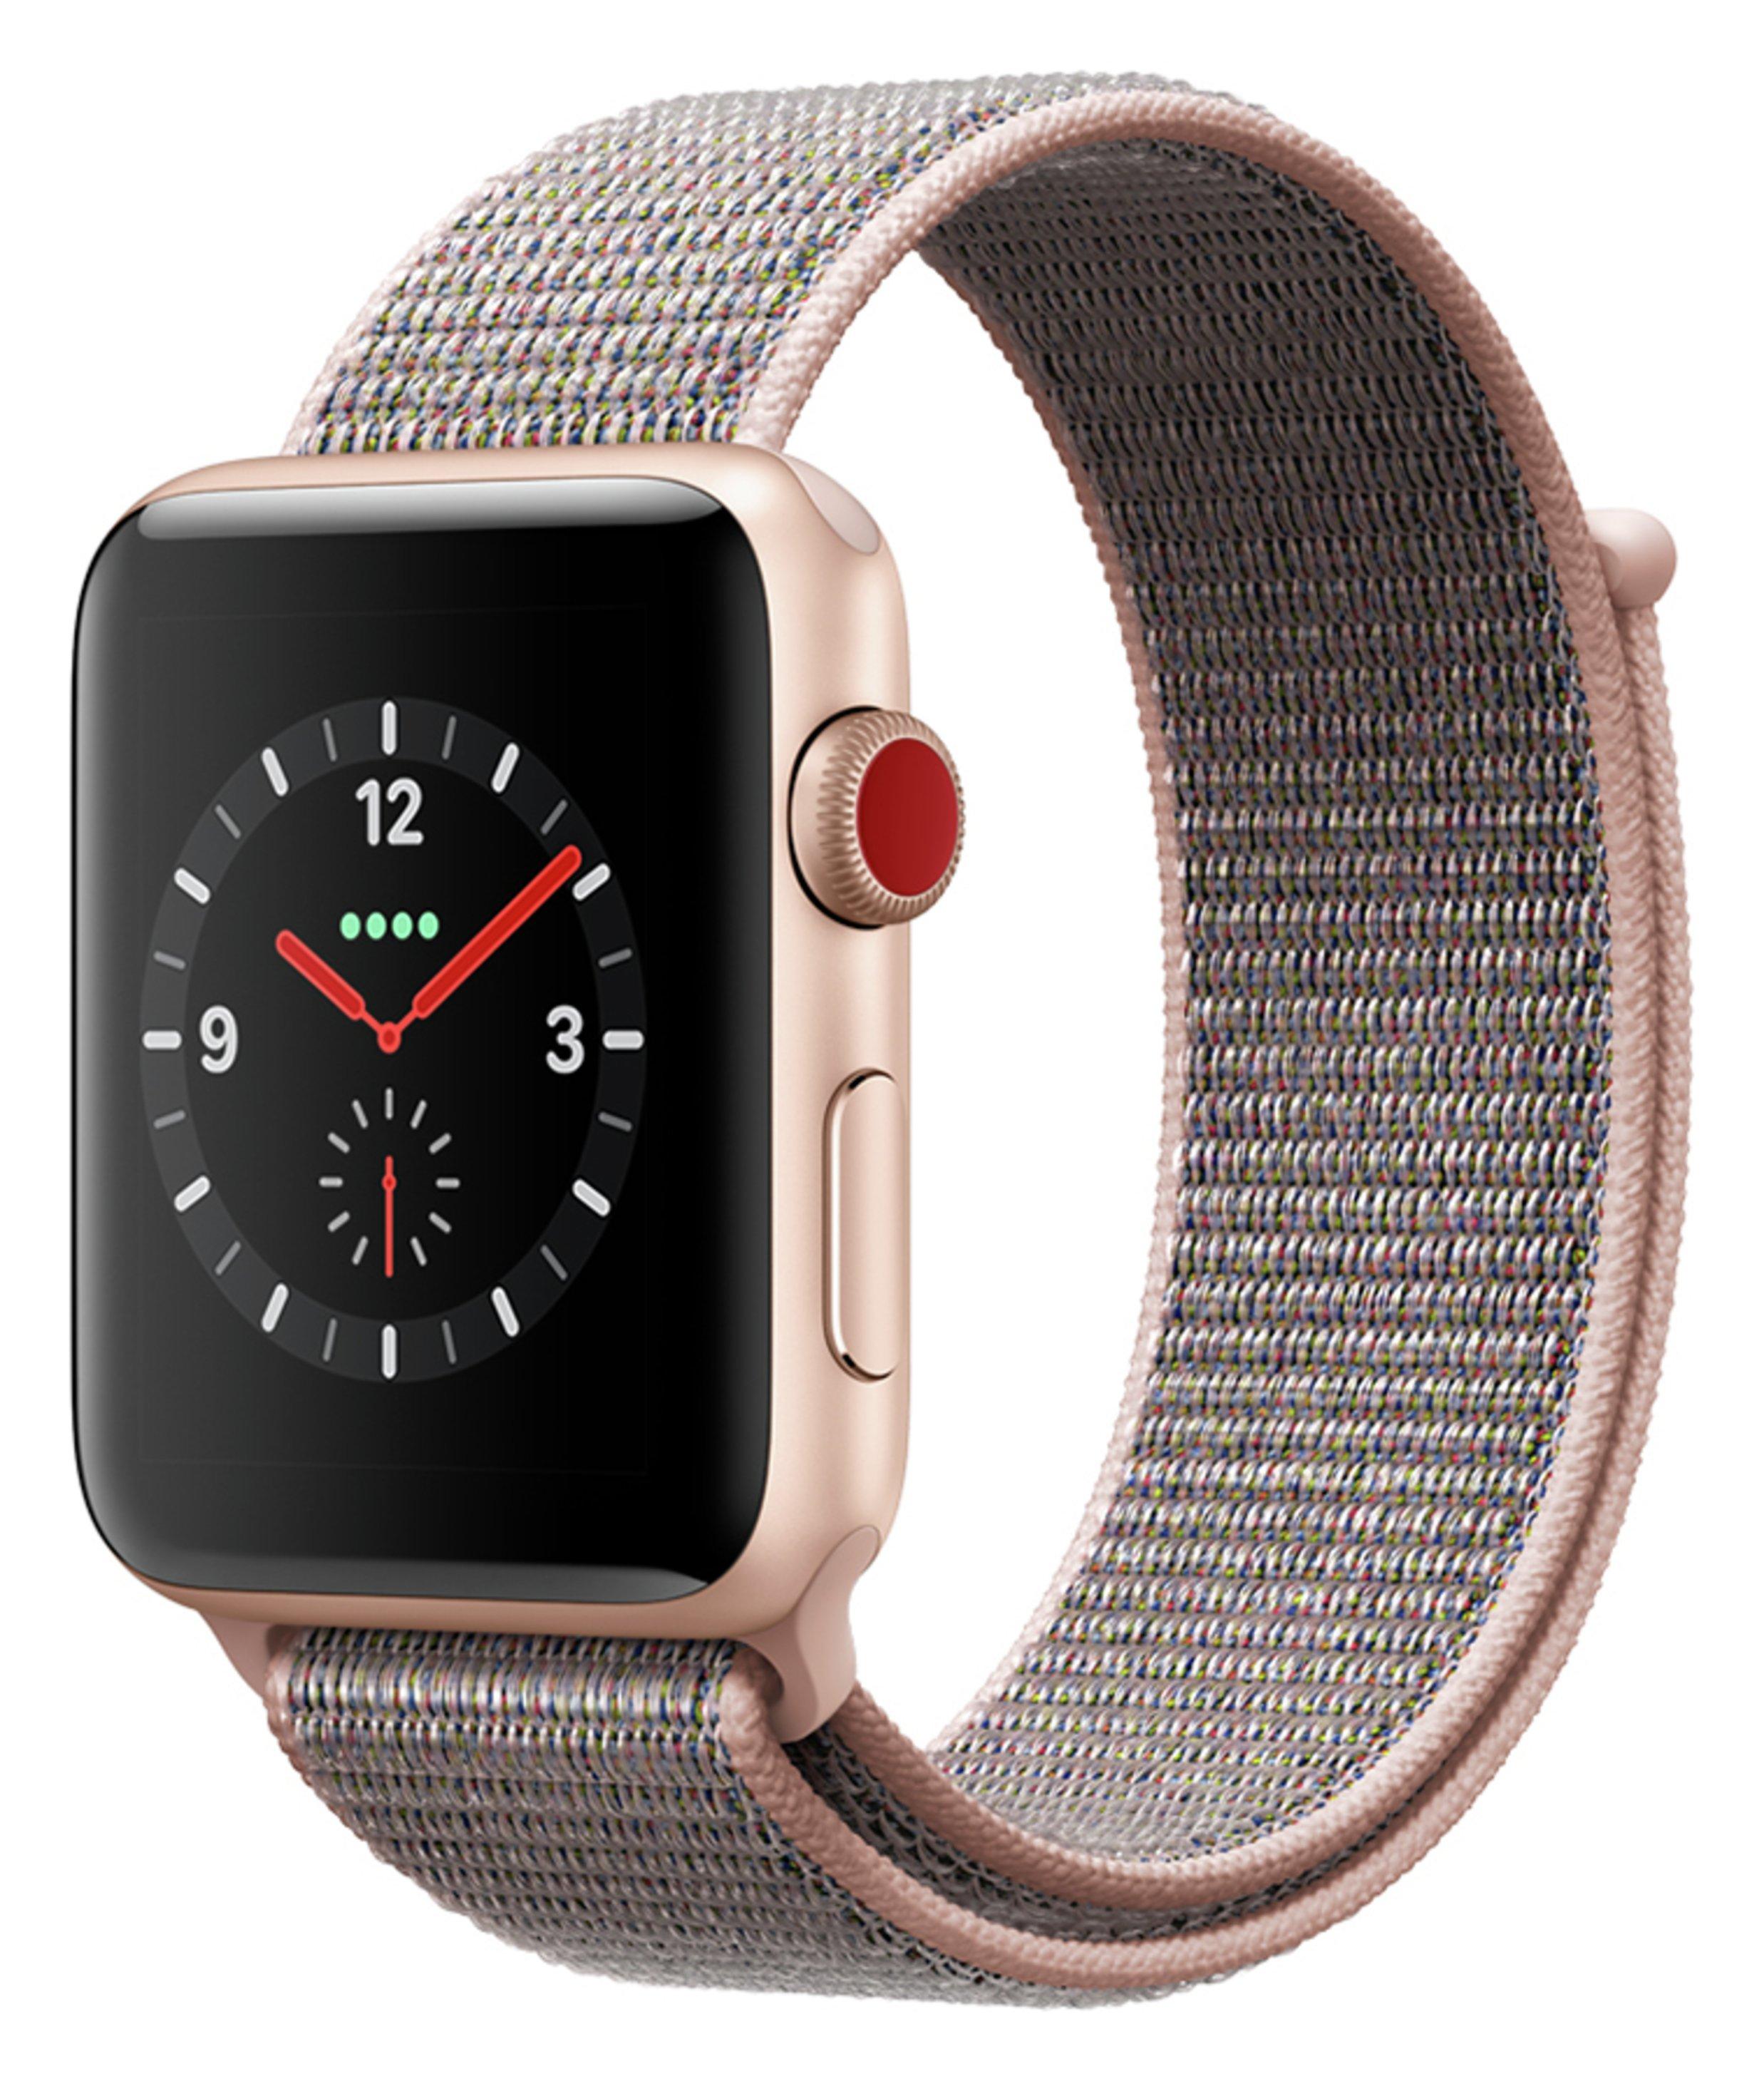 Apple Watch S3 Cellular 38mm Gold Alu Case Pink Loop 7455287 Argos Price Tracker Pricehistory Co Uk